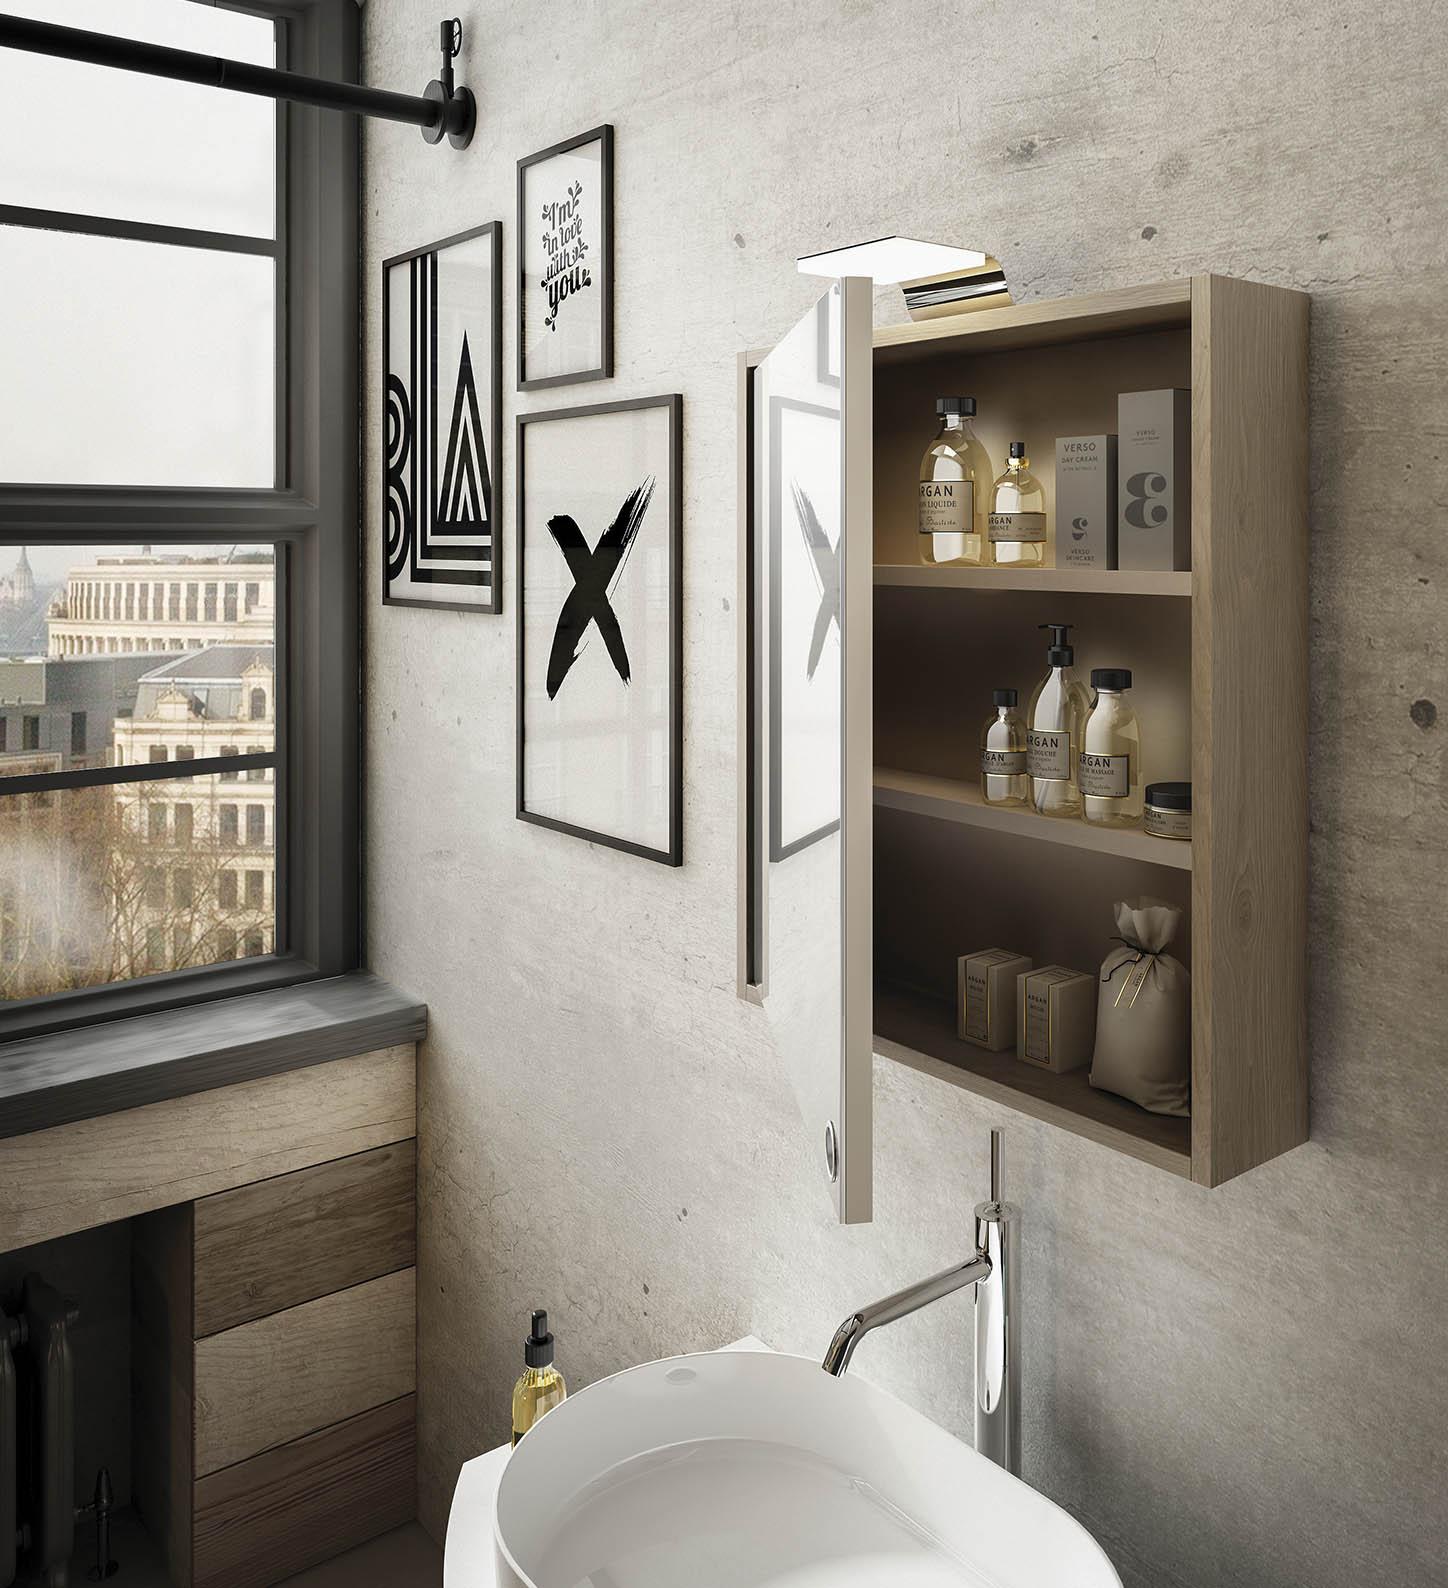 Gran tour mobili bagno il elegante gran tour bagno per residenza with gran tour mobili bagno - Gaia mobili bagno ...